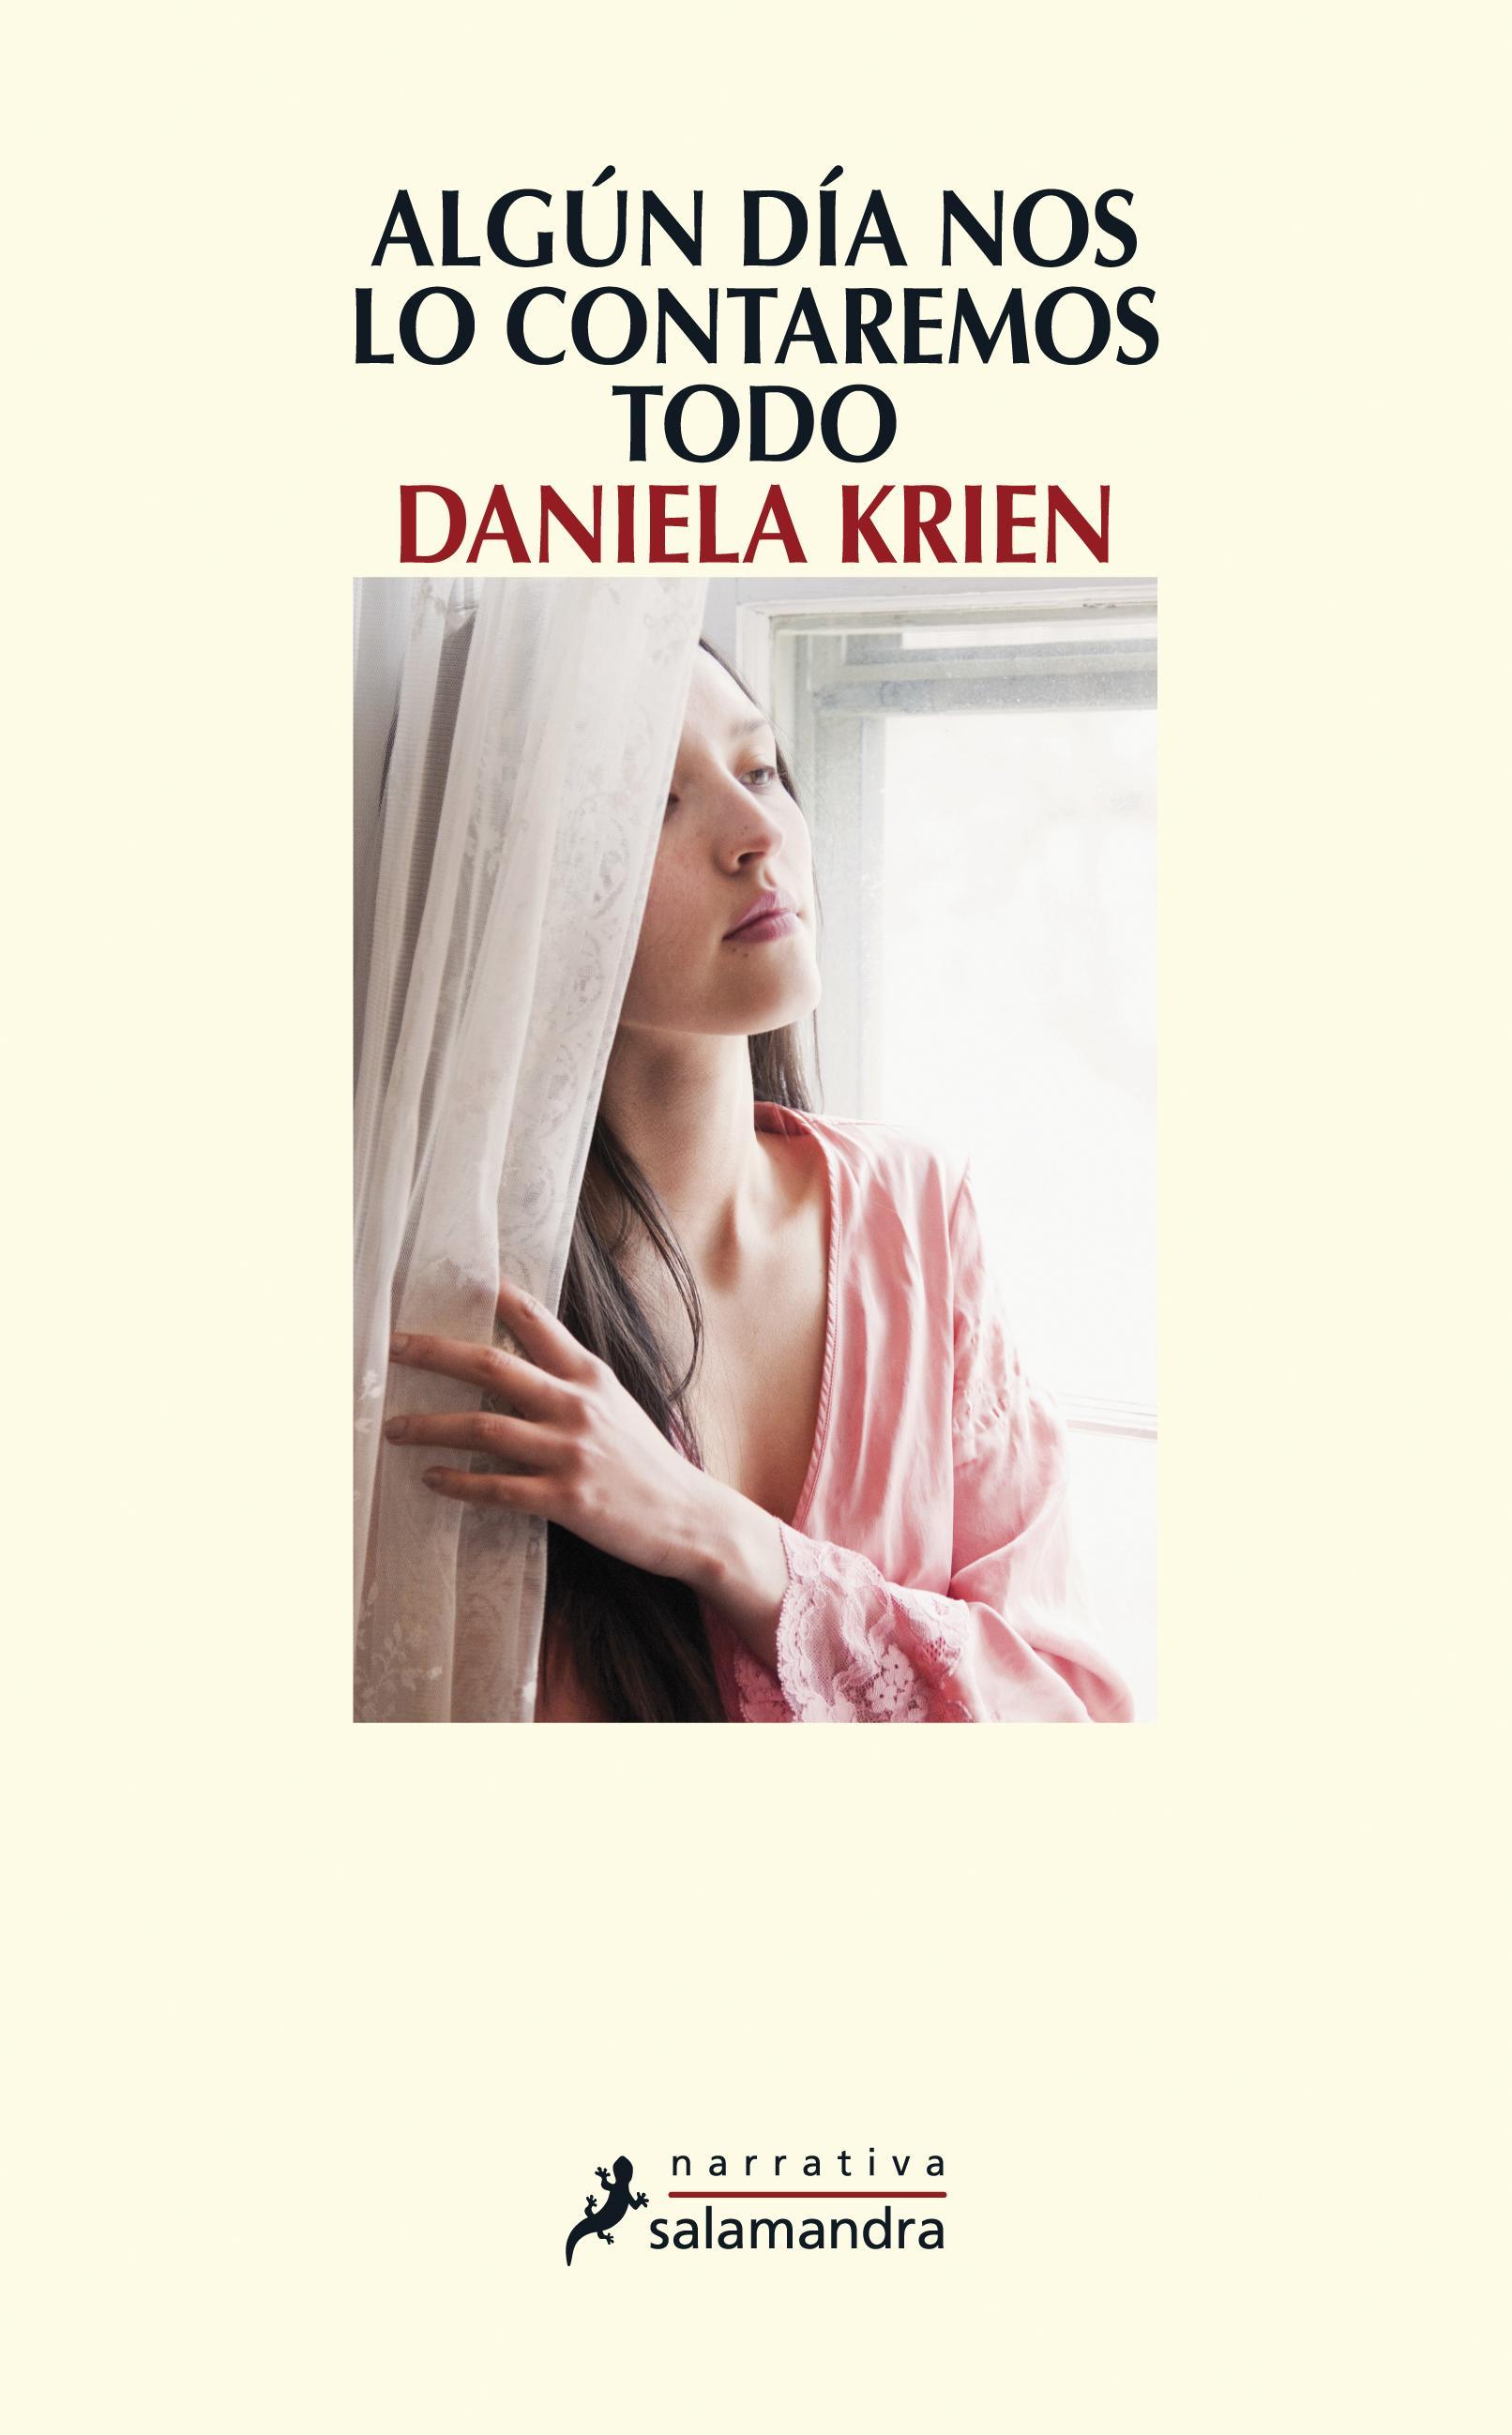 Algún día nos lo contaremos todo (Daniela Krien)